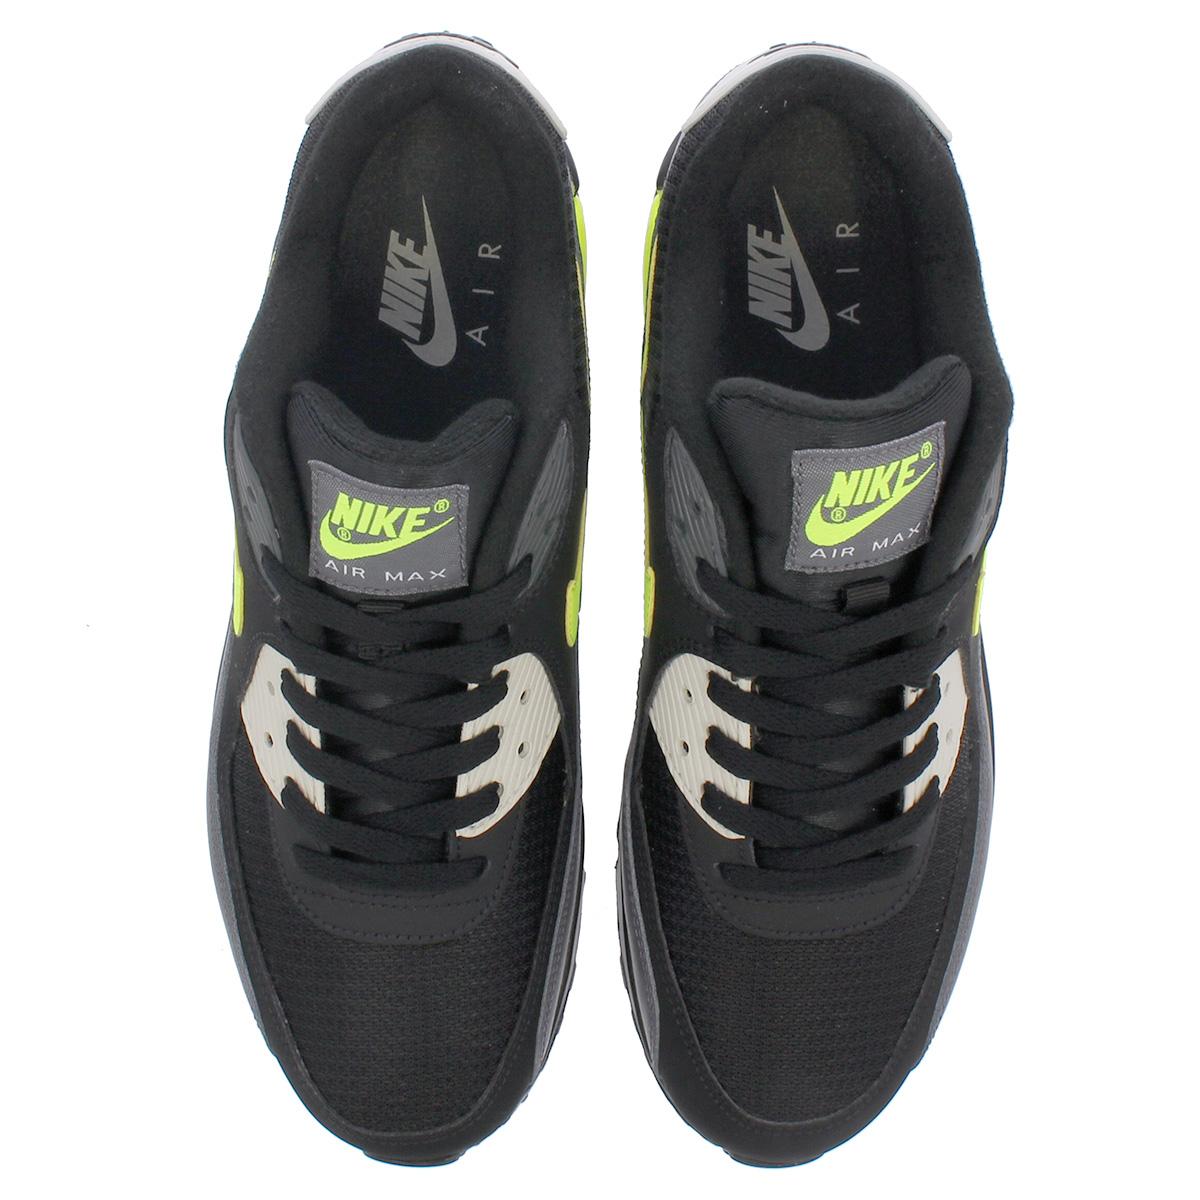 Shoes NIKE Air Max 90 Essential AJ1285 015 Dark GreyVolt